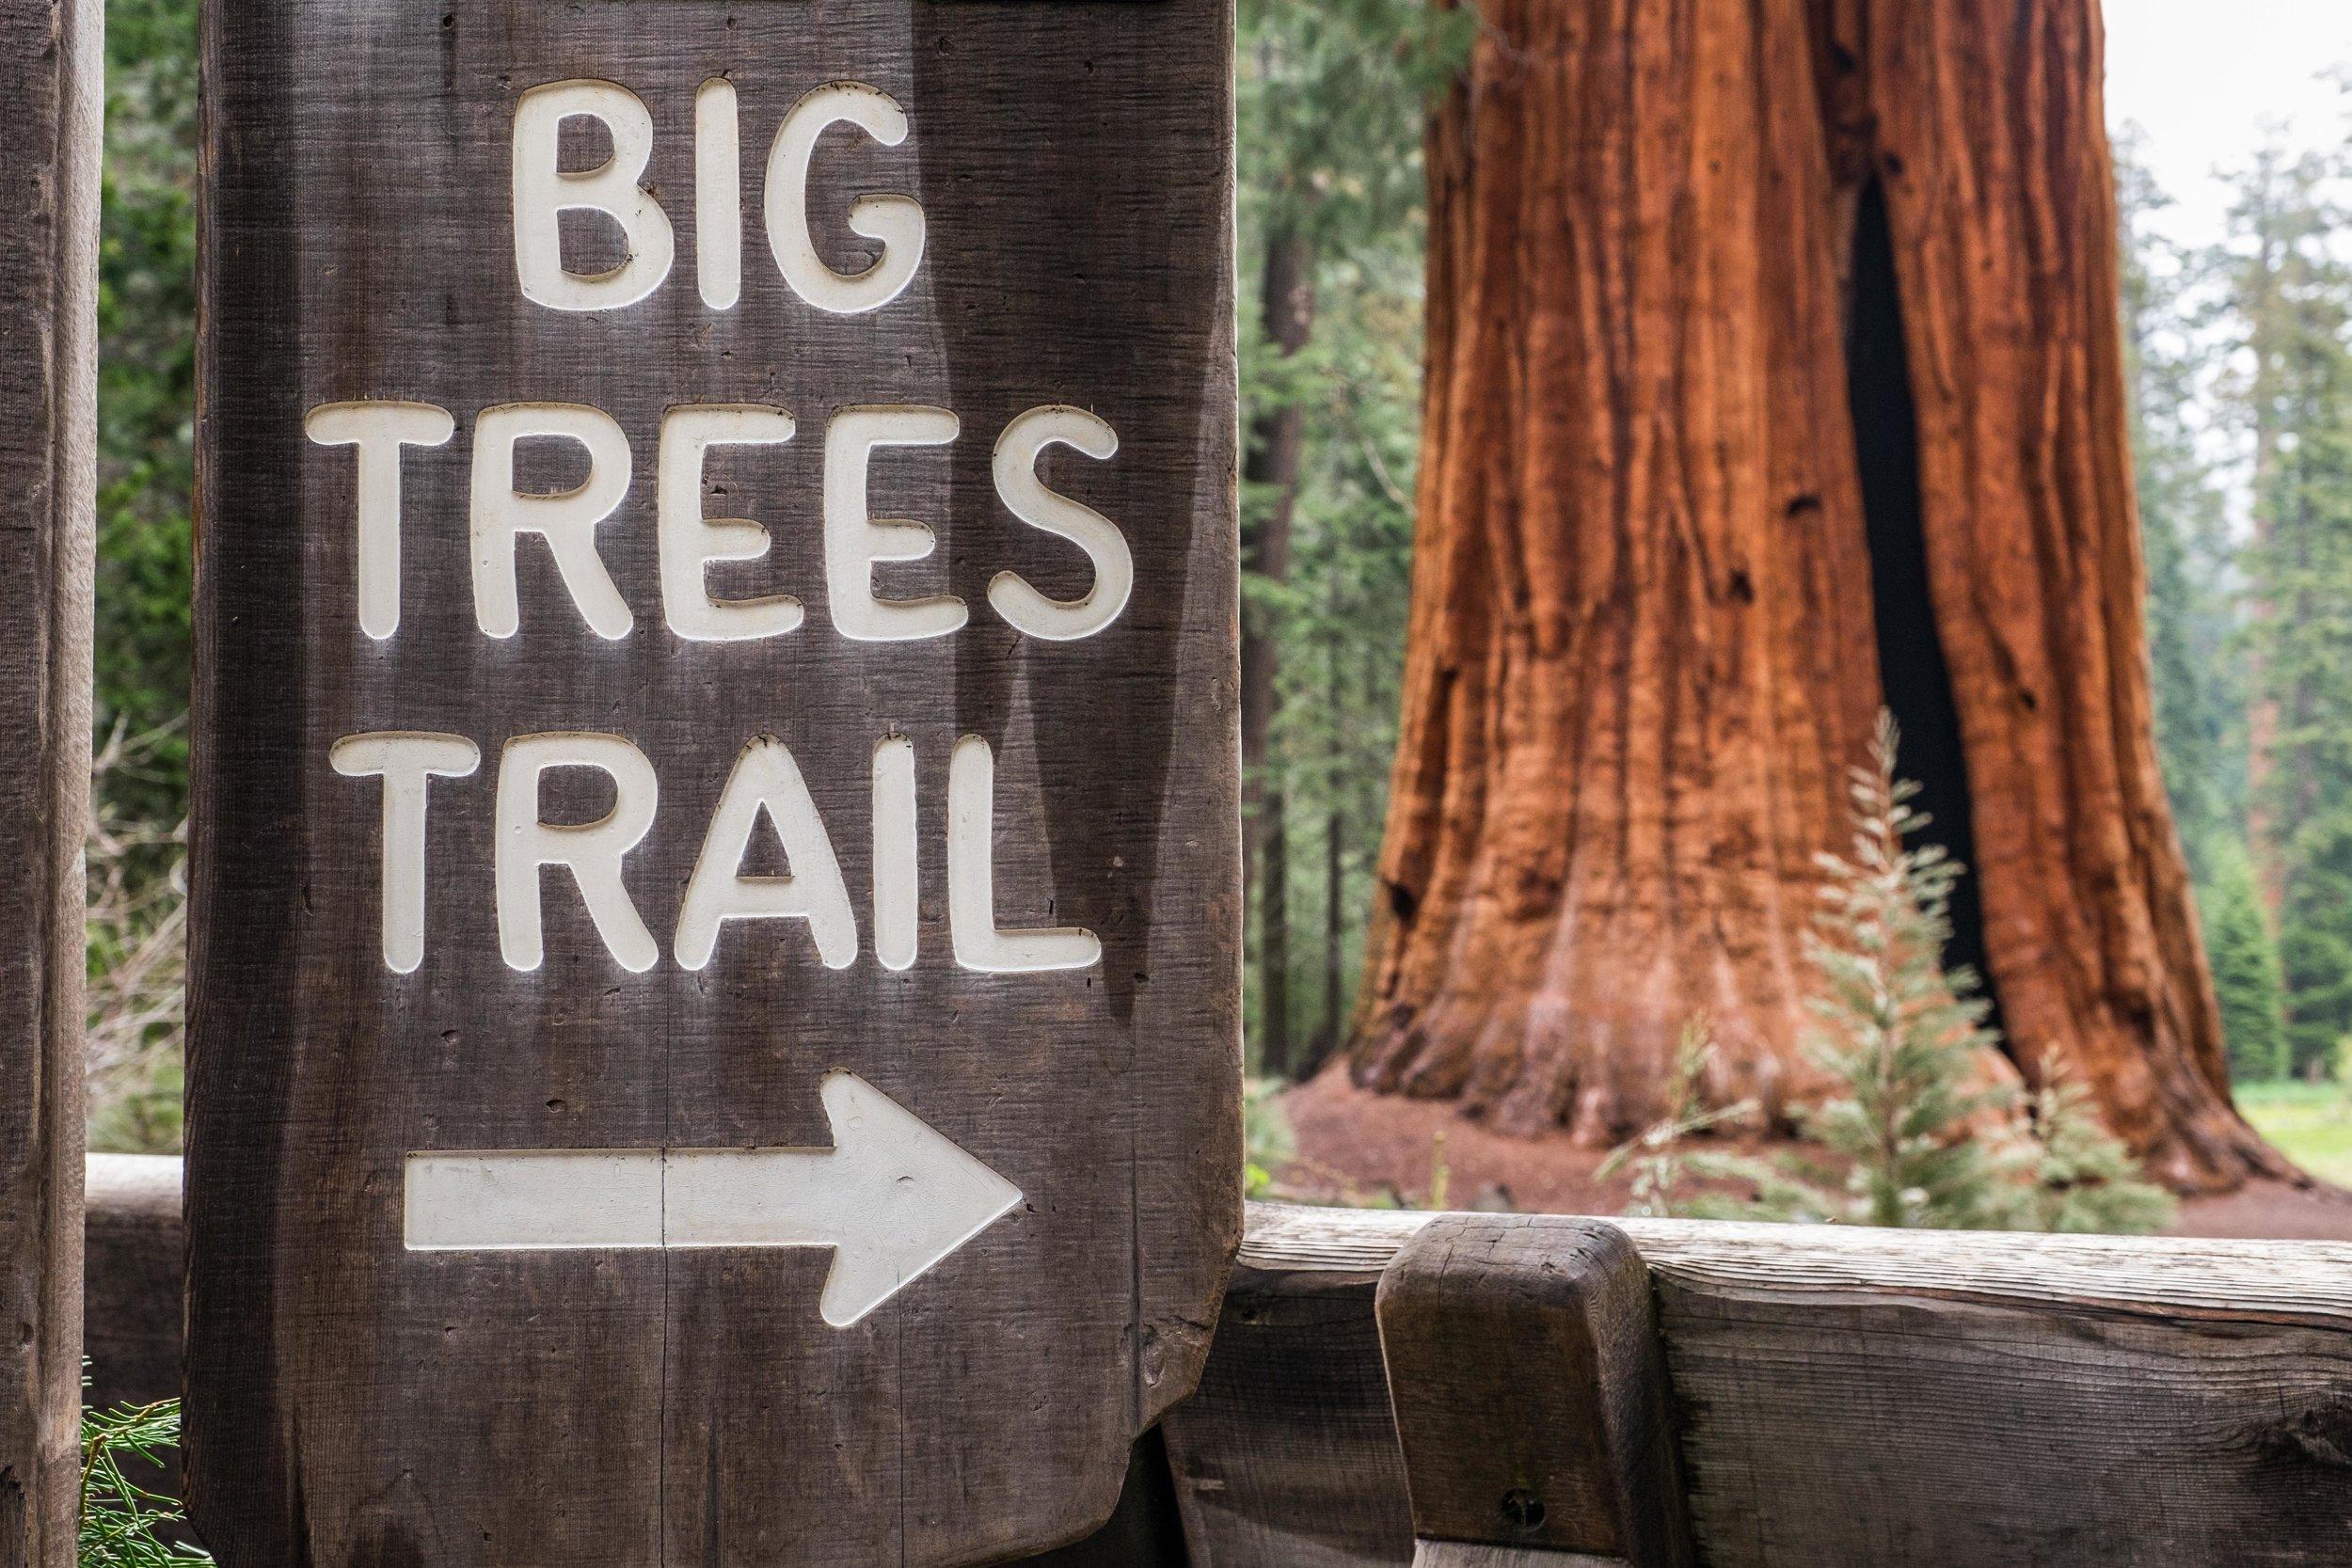 20160506-JI-Sequoia National Park-_DSF8940.jpg